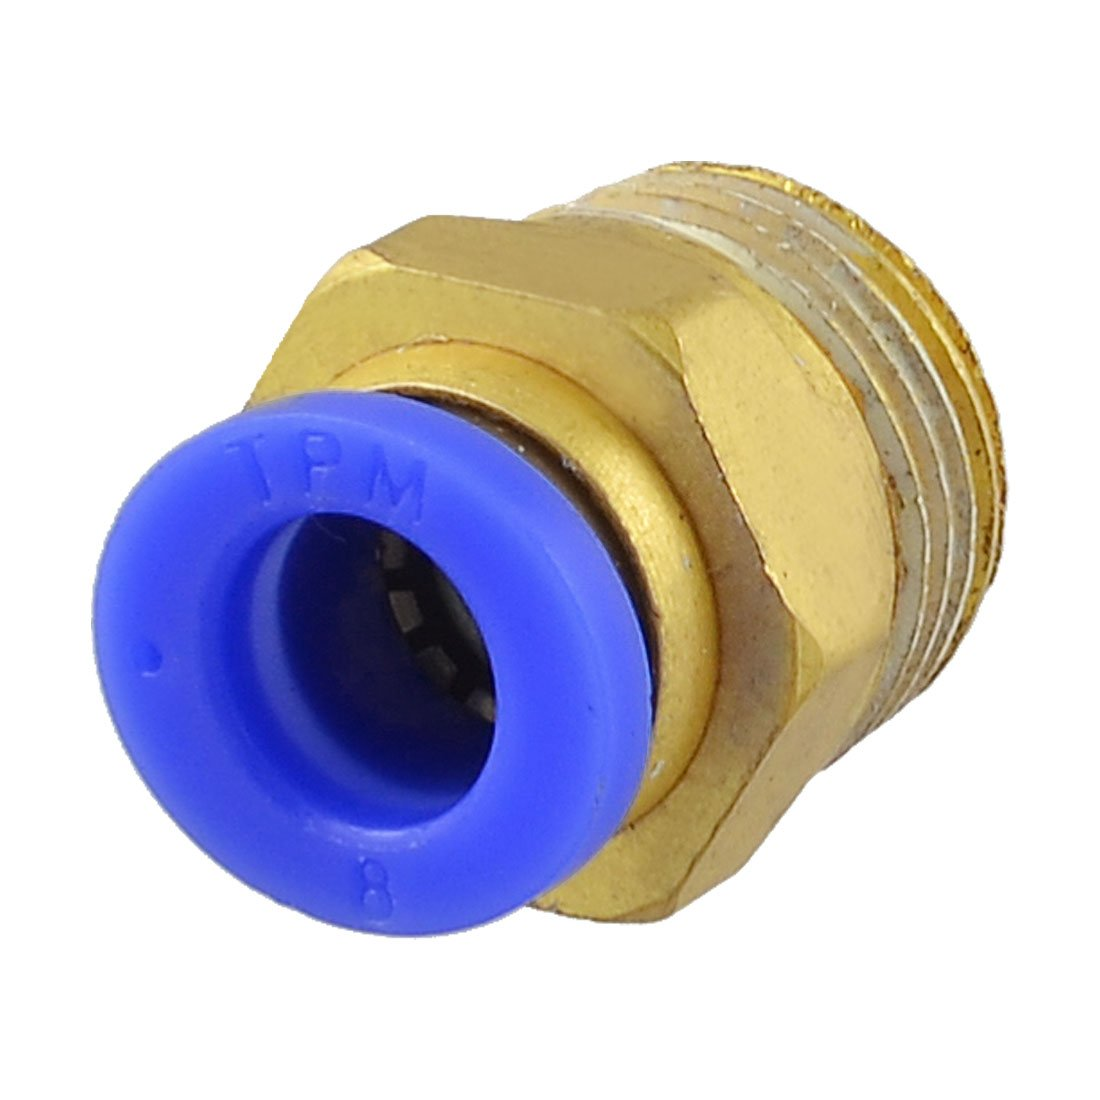 3/20, 3 cm PT rosca macho de 8 mm tubo presionar Connect lisos de fijació n rá pida 3cm PT rosca macho de 8mm tubo presionar Connect lisos de fijación rápida Sourcingmap a13030600ux1104